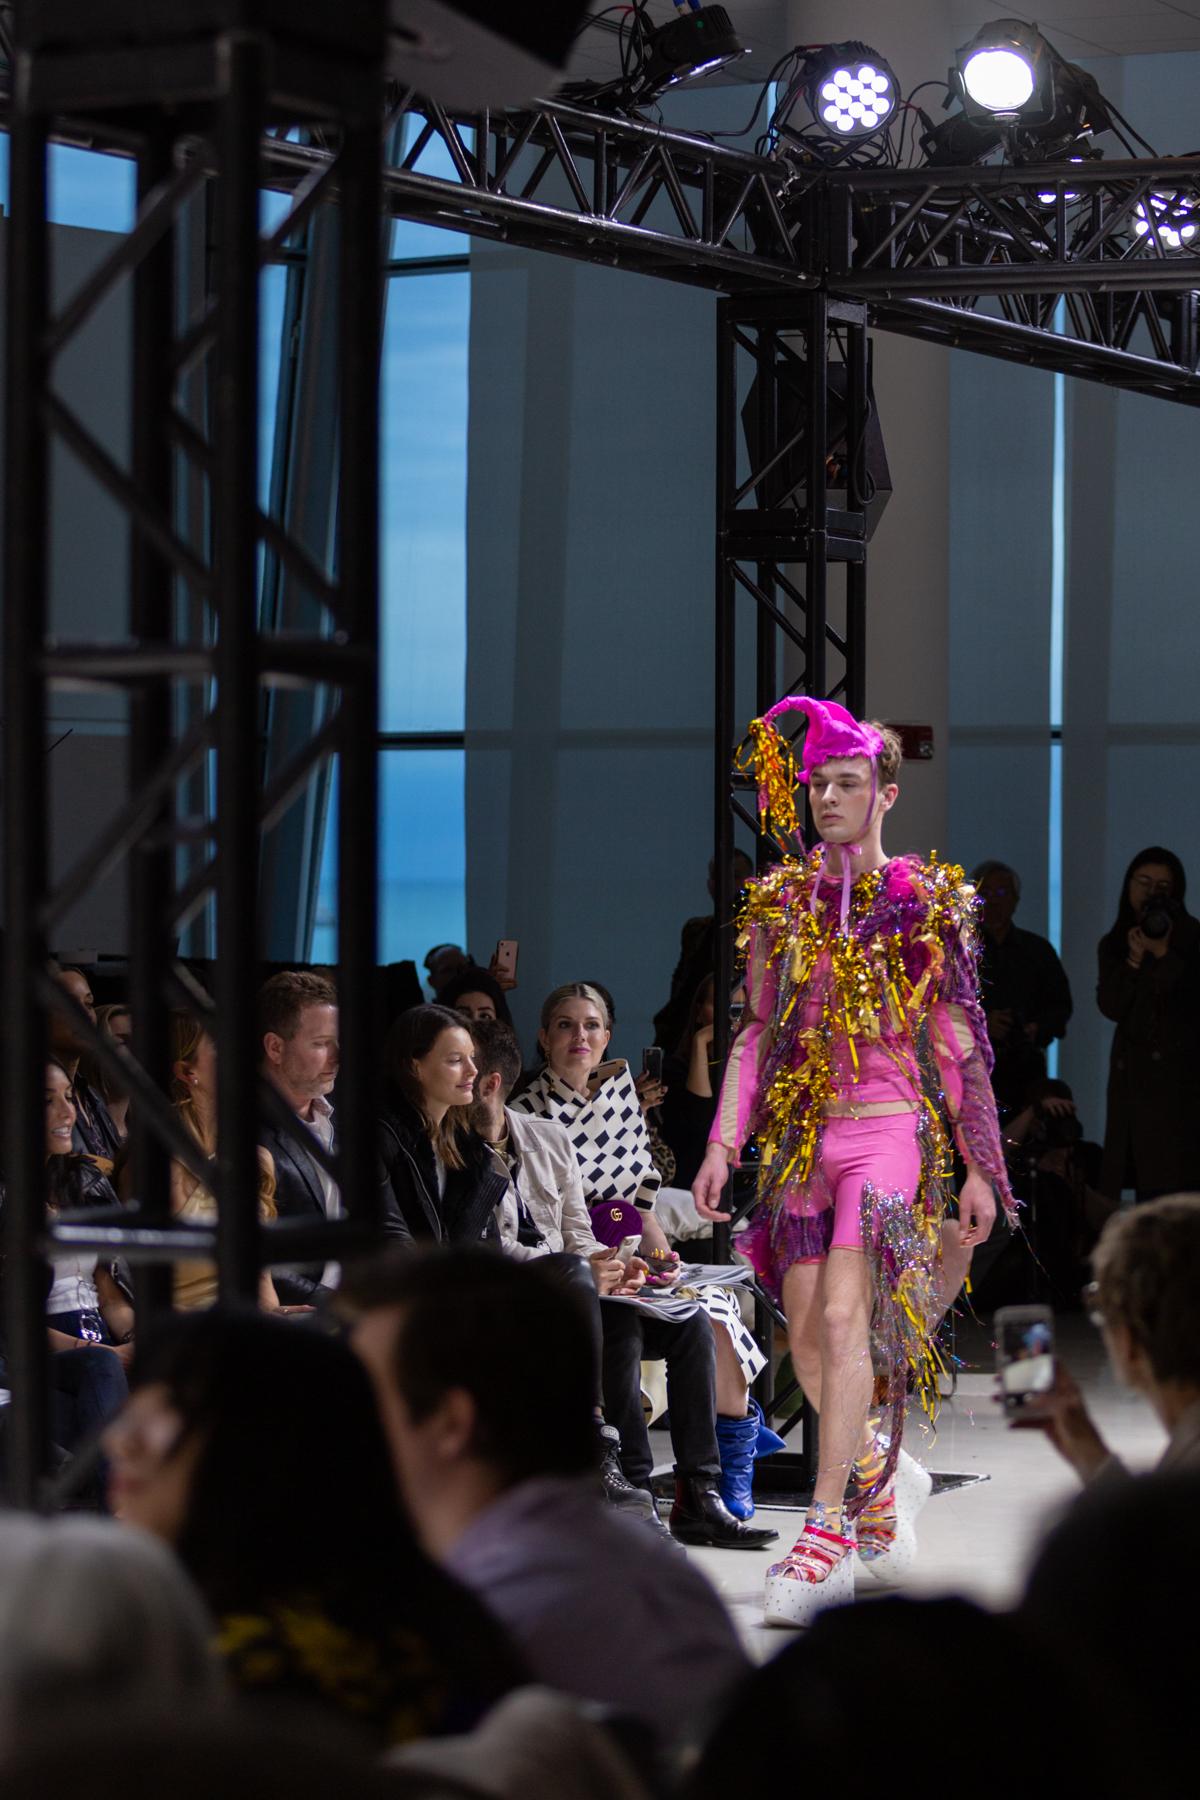 connor_fenwick_saic_fashion_event_lyons_01.jpg